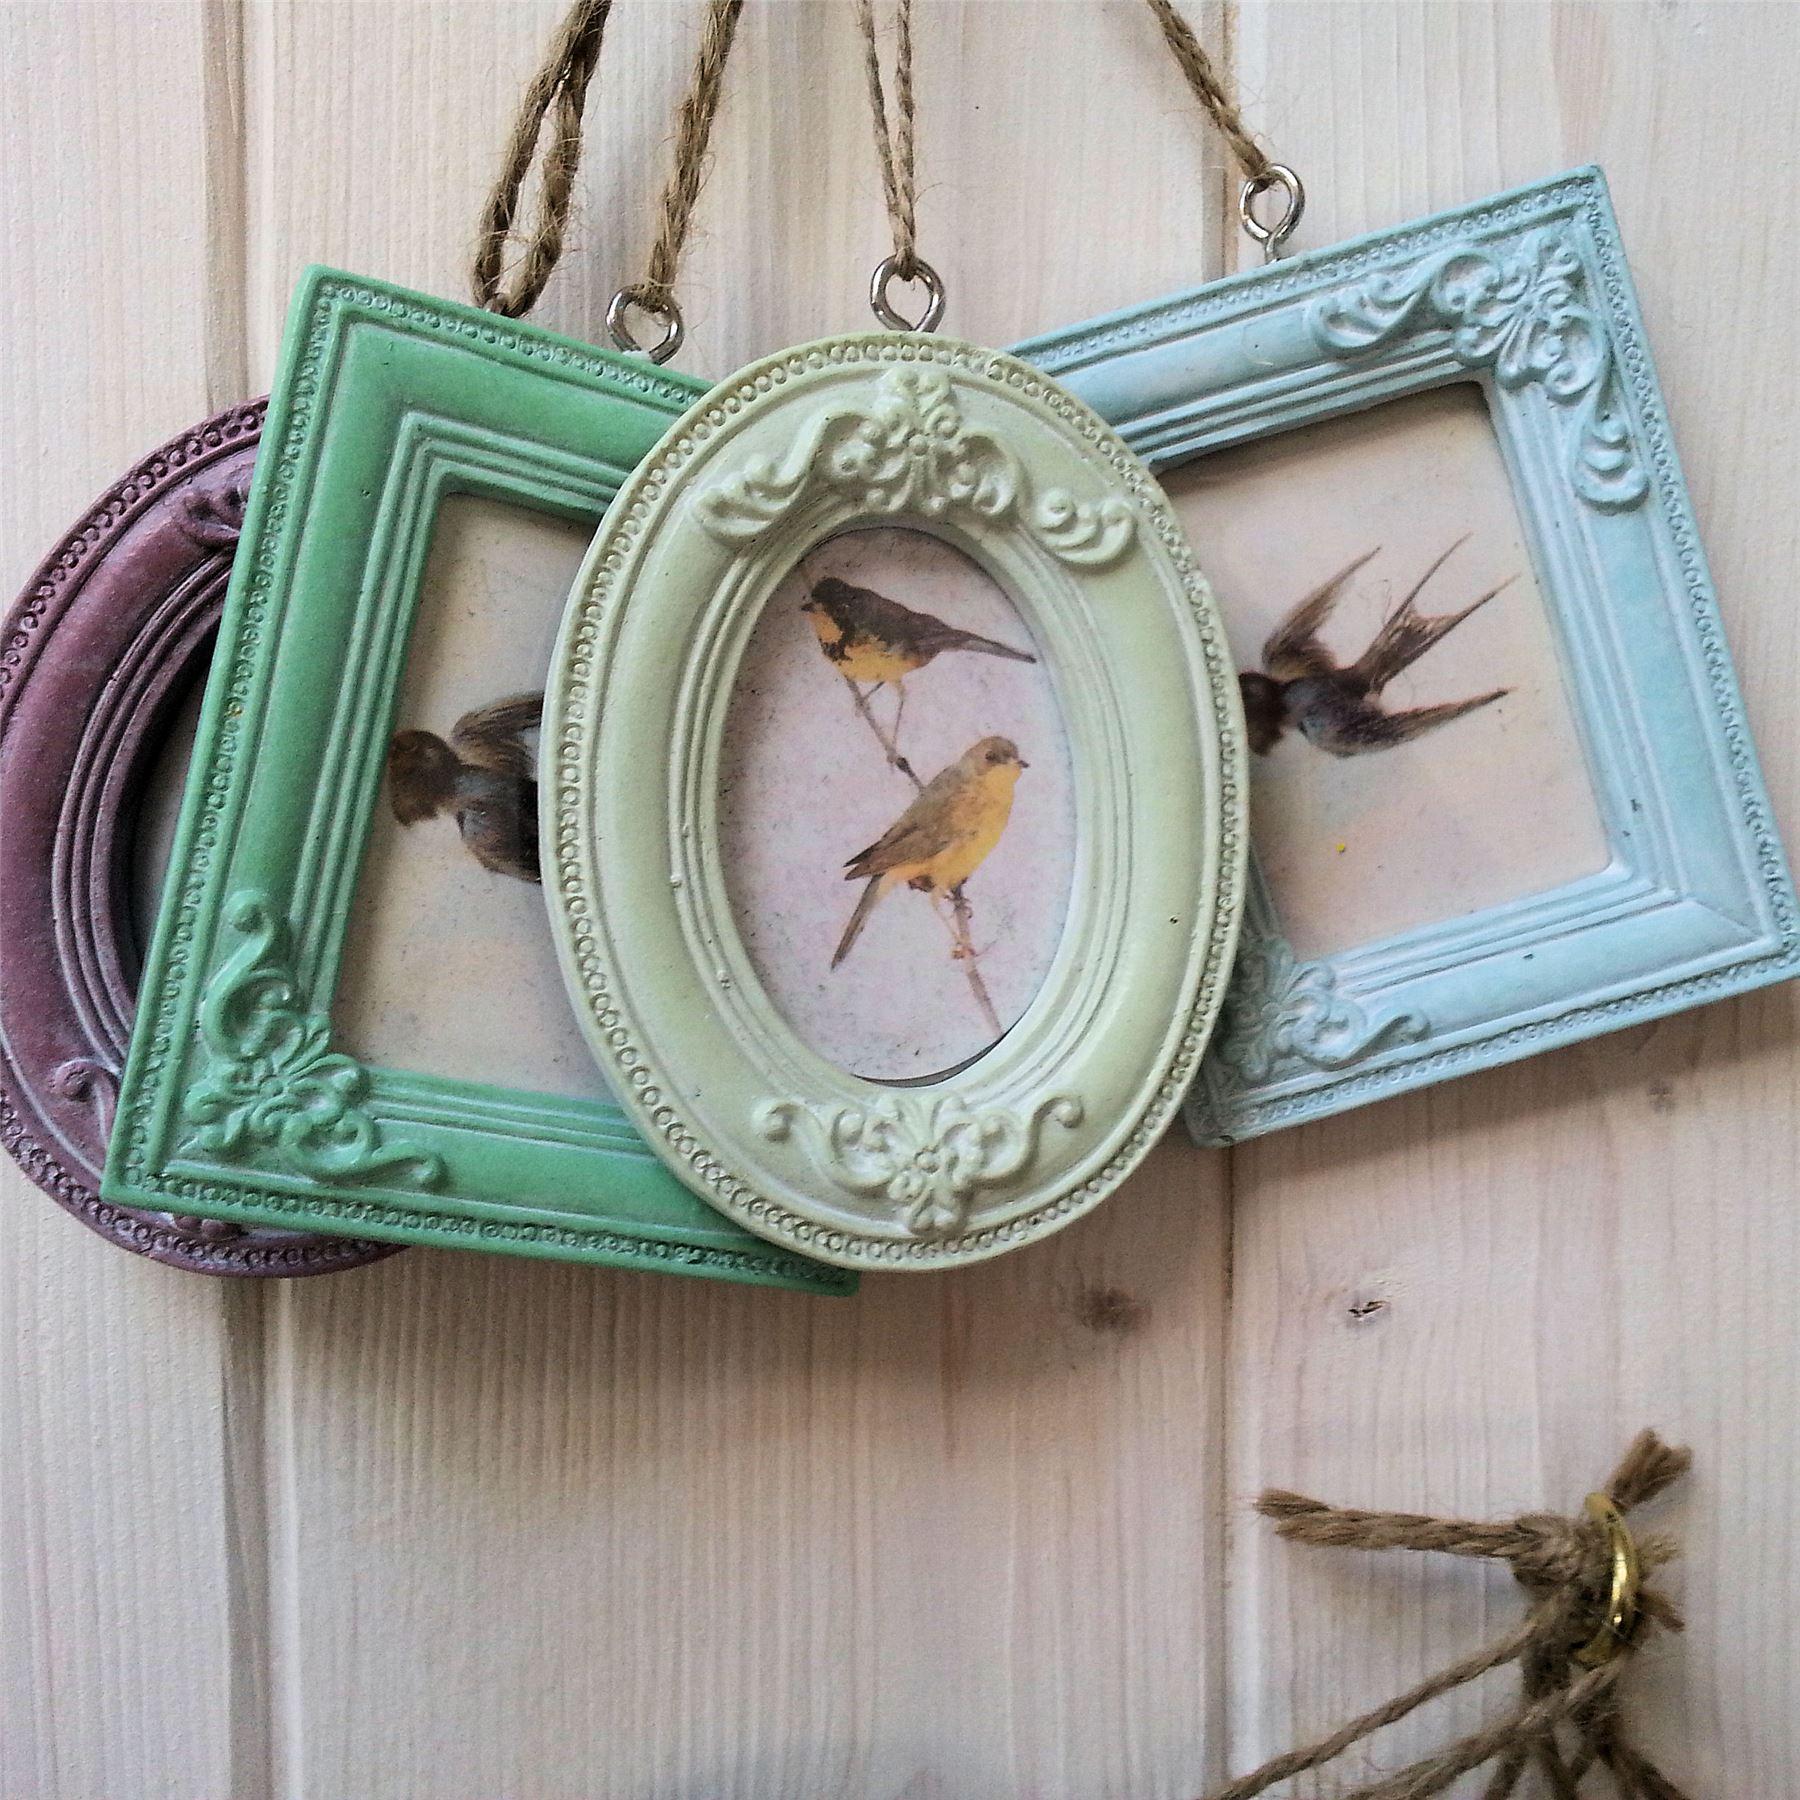 After: Handmade Photo Frame Pinterest Display, Hanging photos Mini hanging craft photo frames